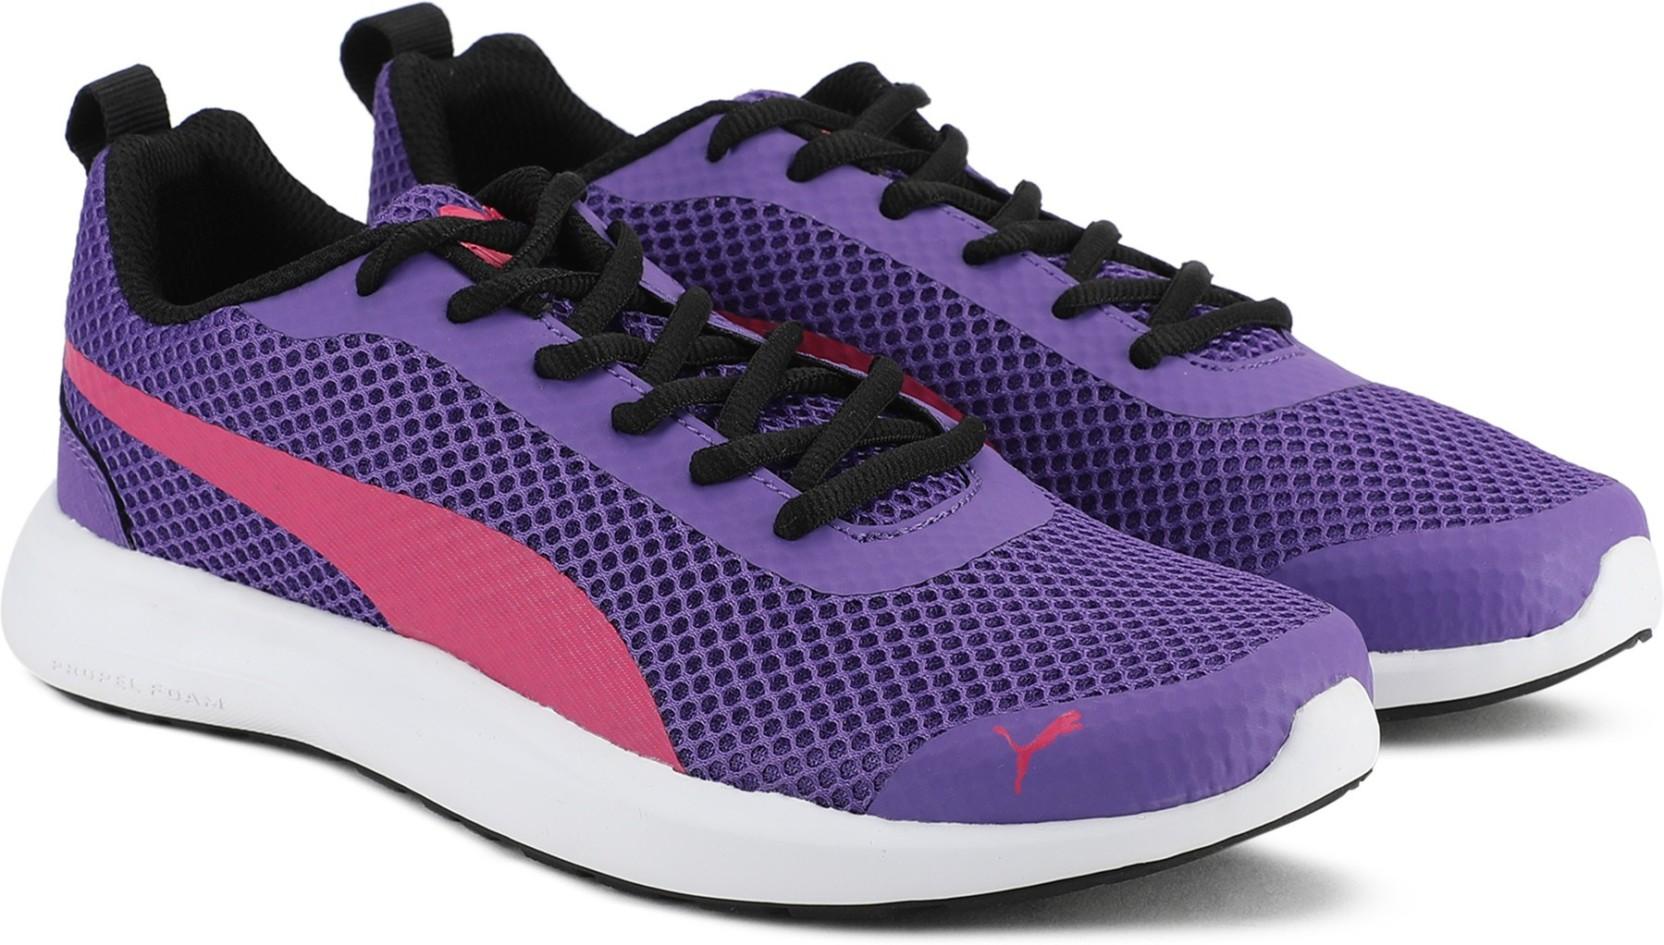 c3b8f4fb9b5a33 Puma Echelon V1 IDP Running Shoes For Women - Buy Puma Echelon V1 ...